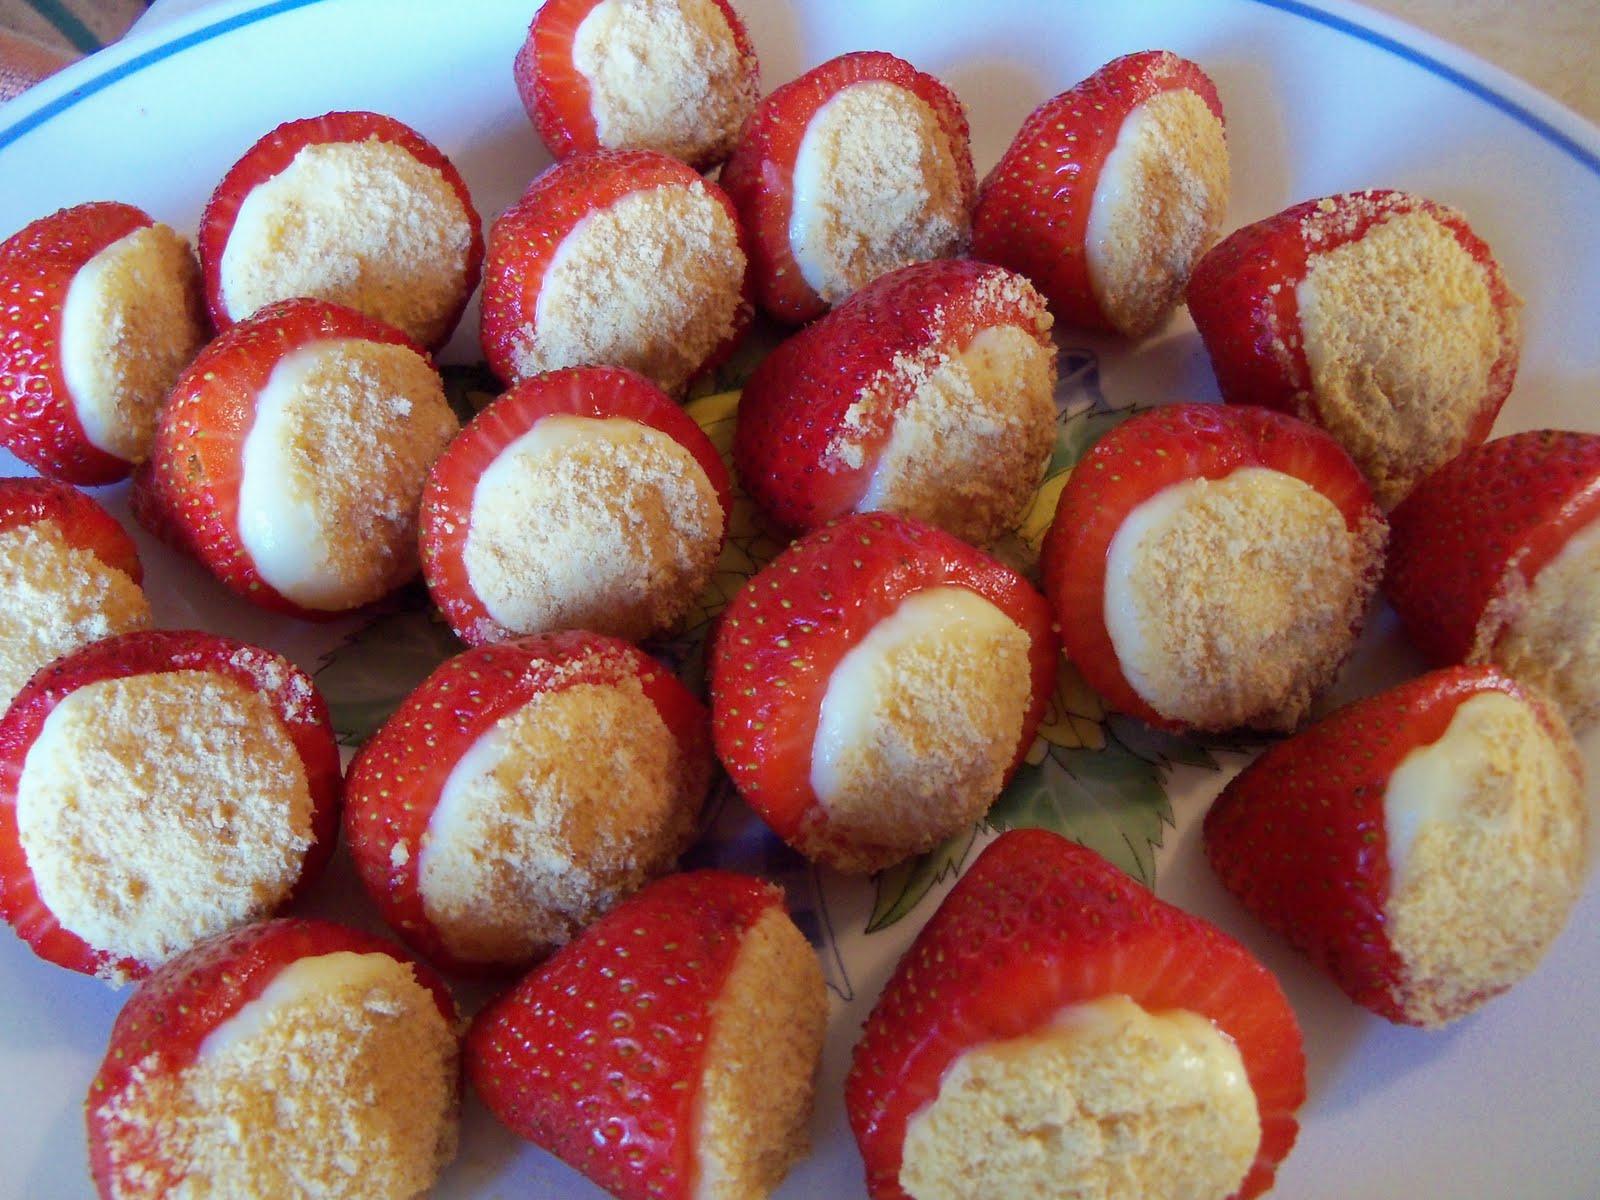 Please Don't Burnette!: Strawberry Cheesecake Bites